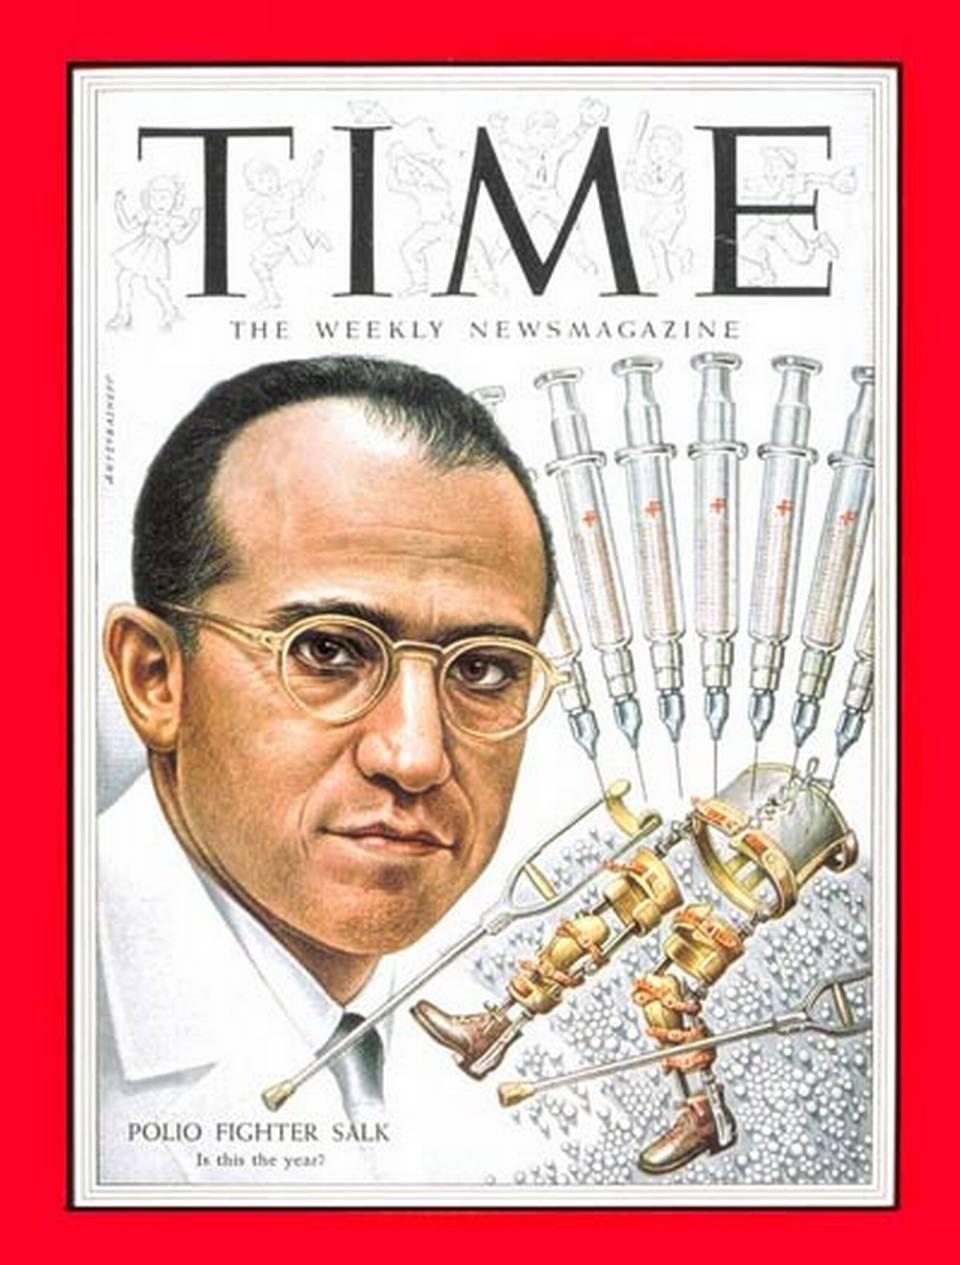 Jonas Salk, en la portada de la revista Time de 1954.}